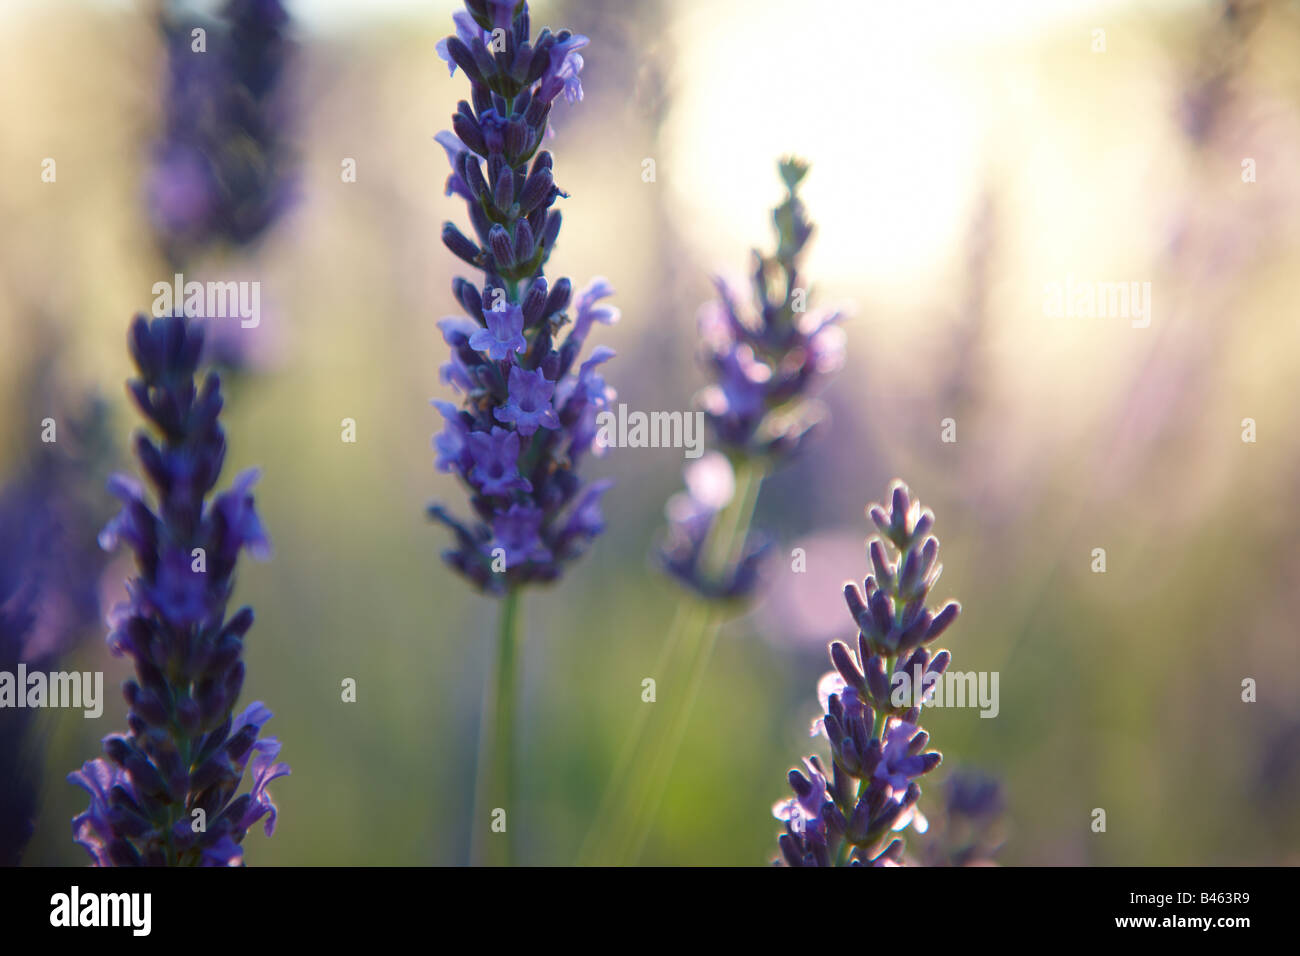 lavender, Provence, France - Stock Image